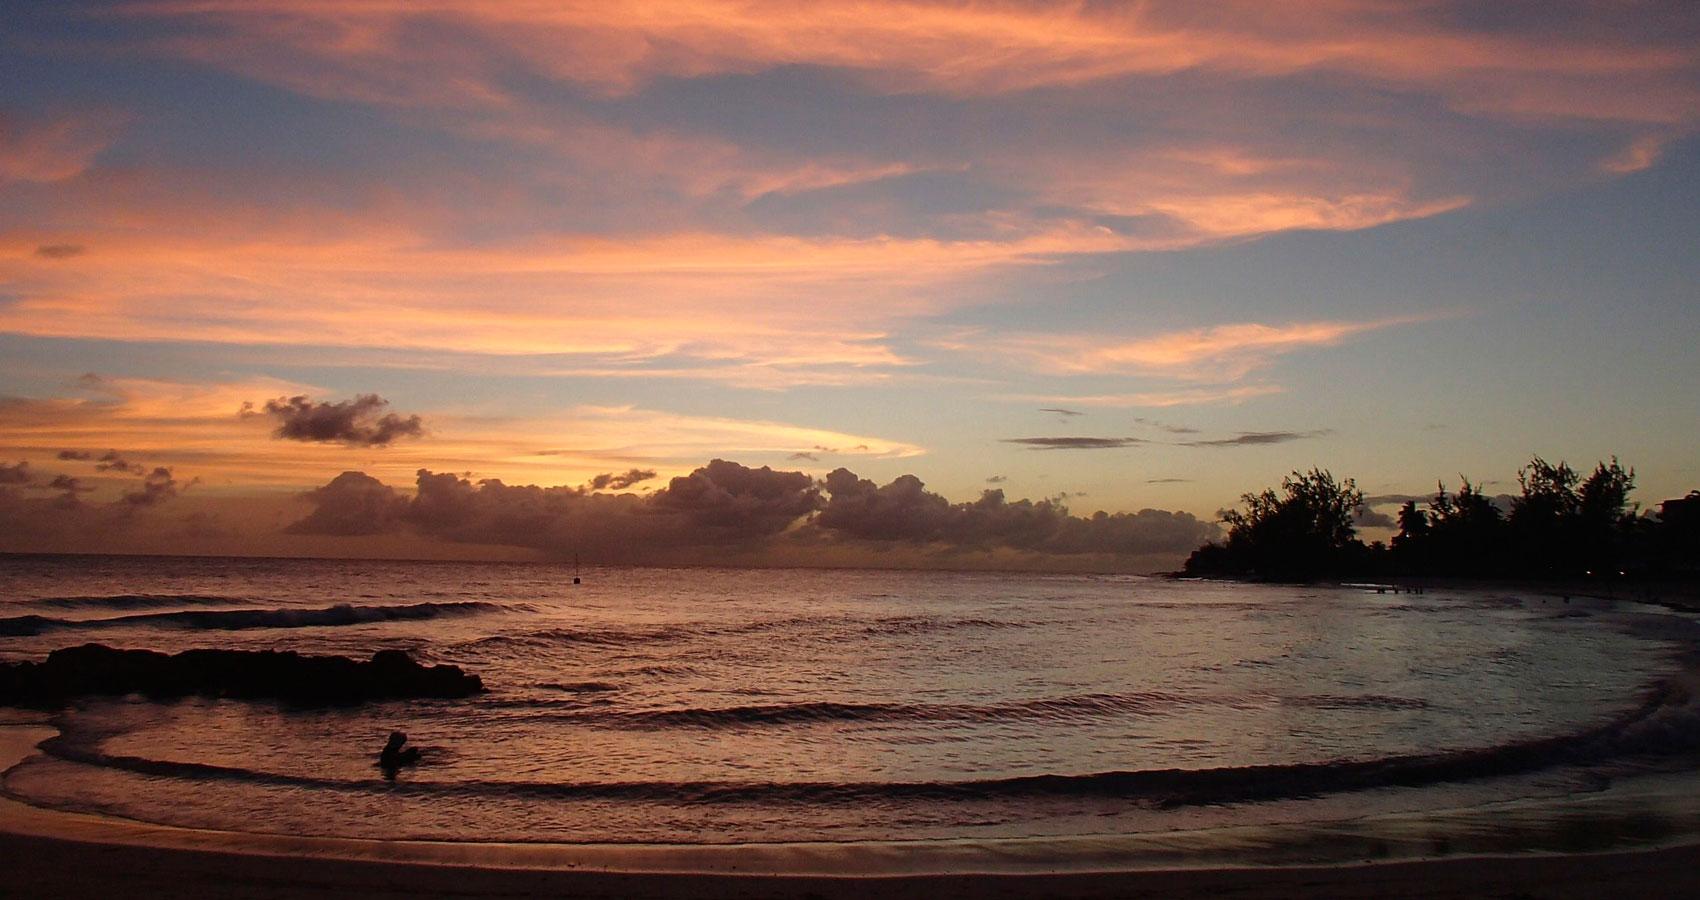 Dawn by Linda Dobinson at Spillwords.com